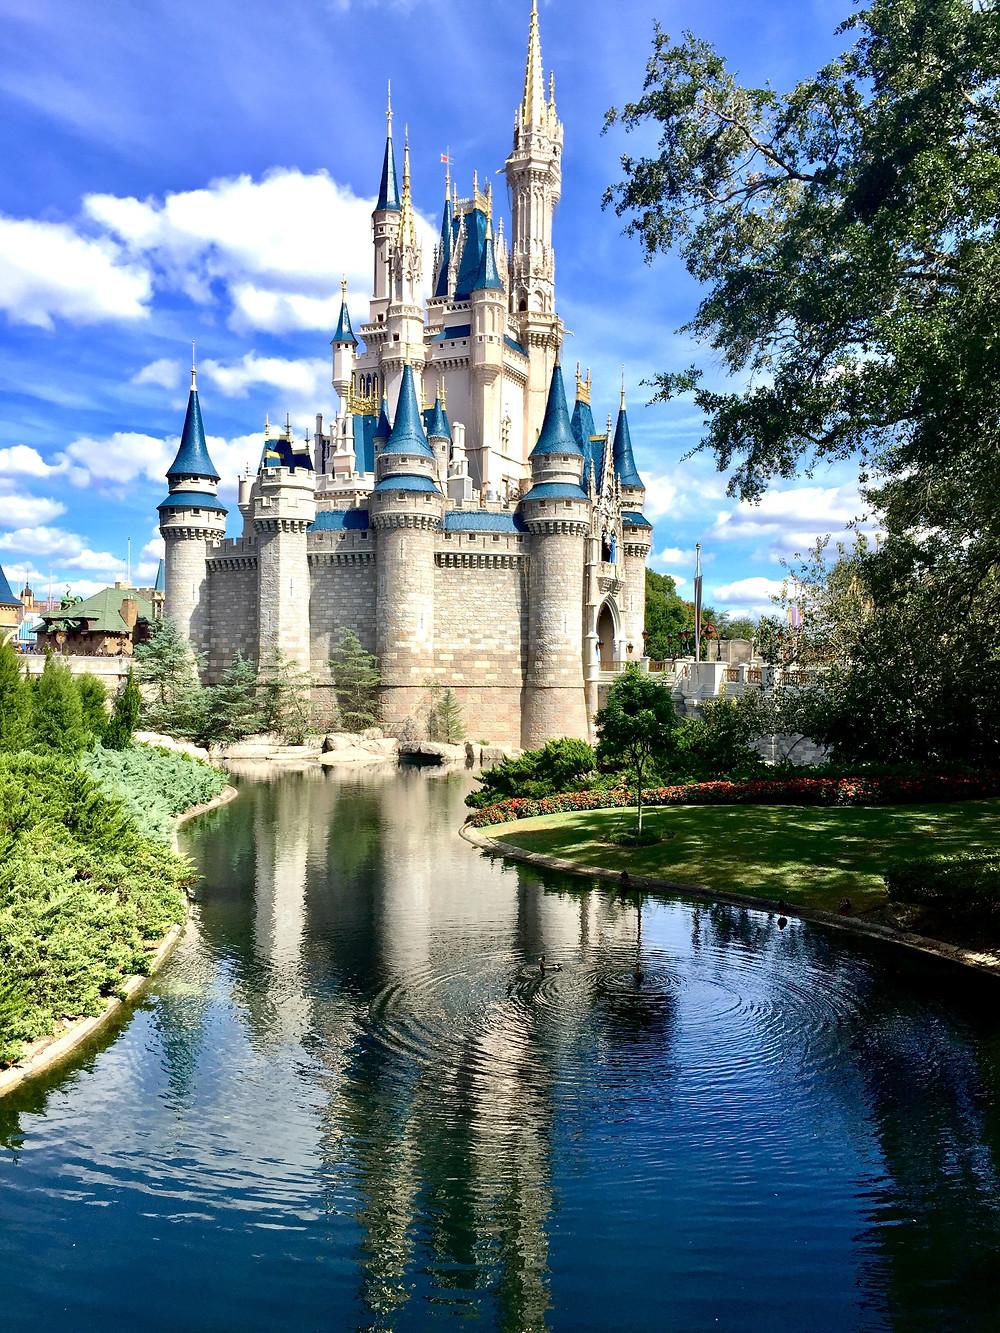 Disney princess castle behind the little river.